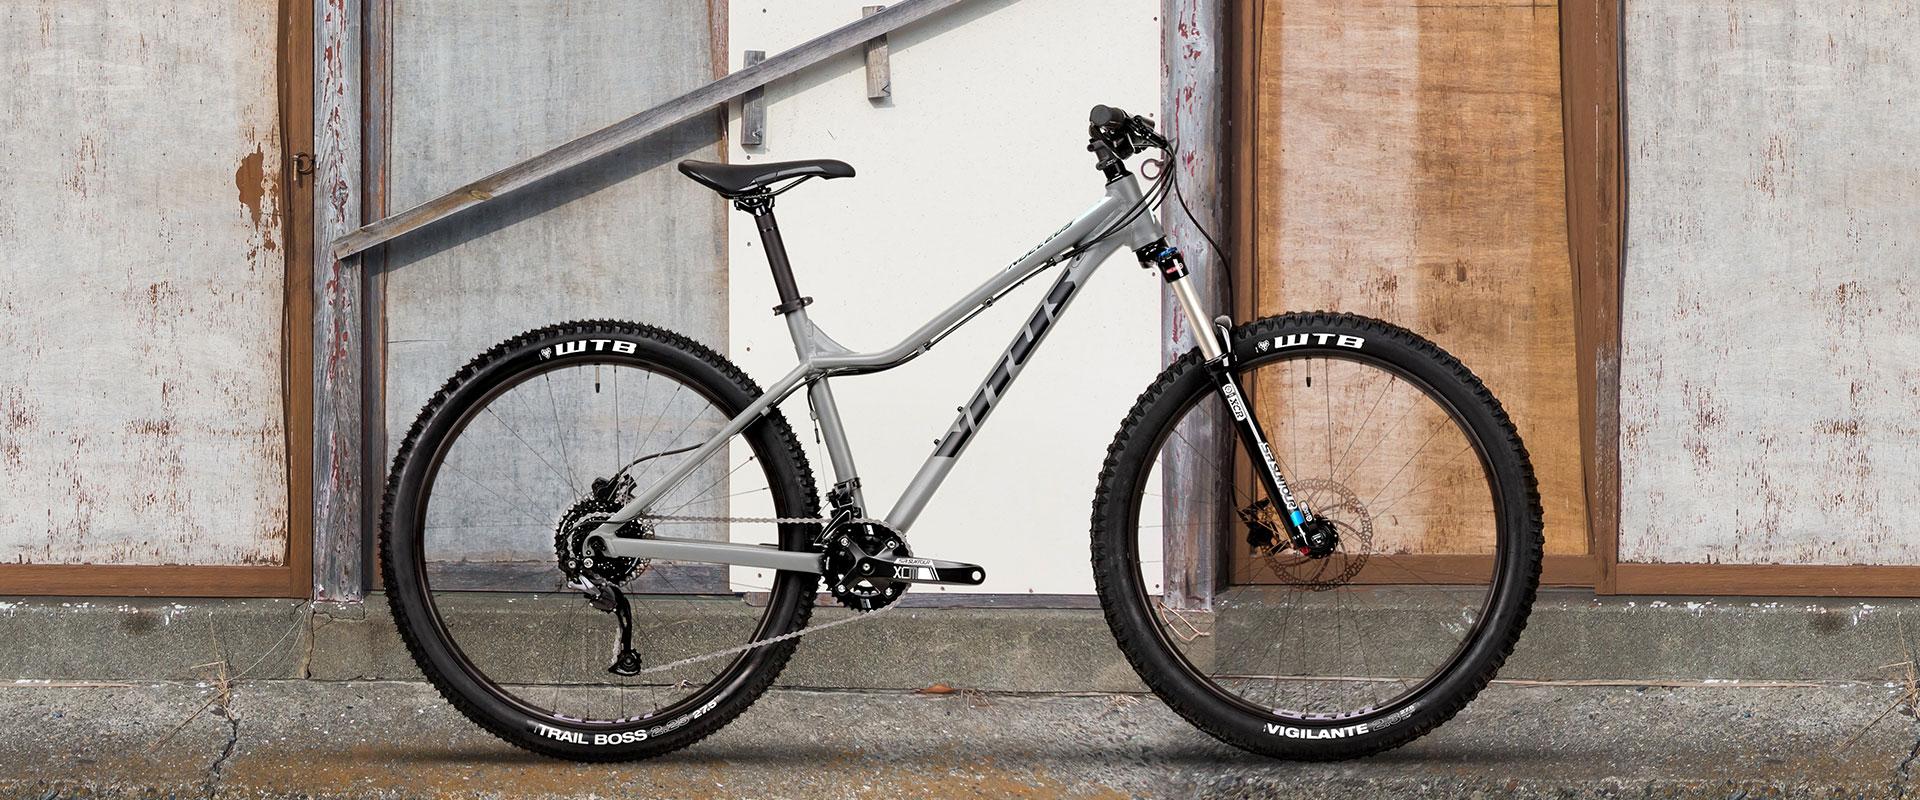 Nucleus 27 VRW Womens Bike Altus 2x9